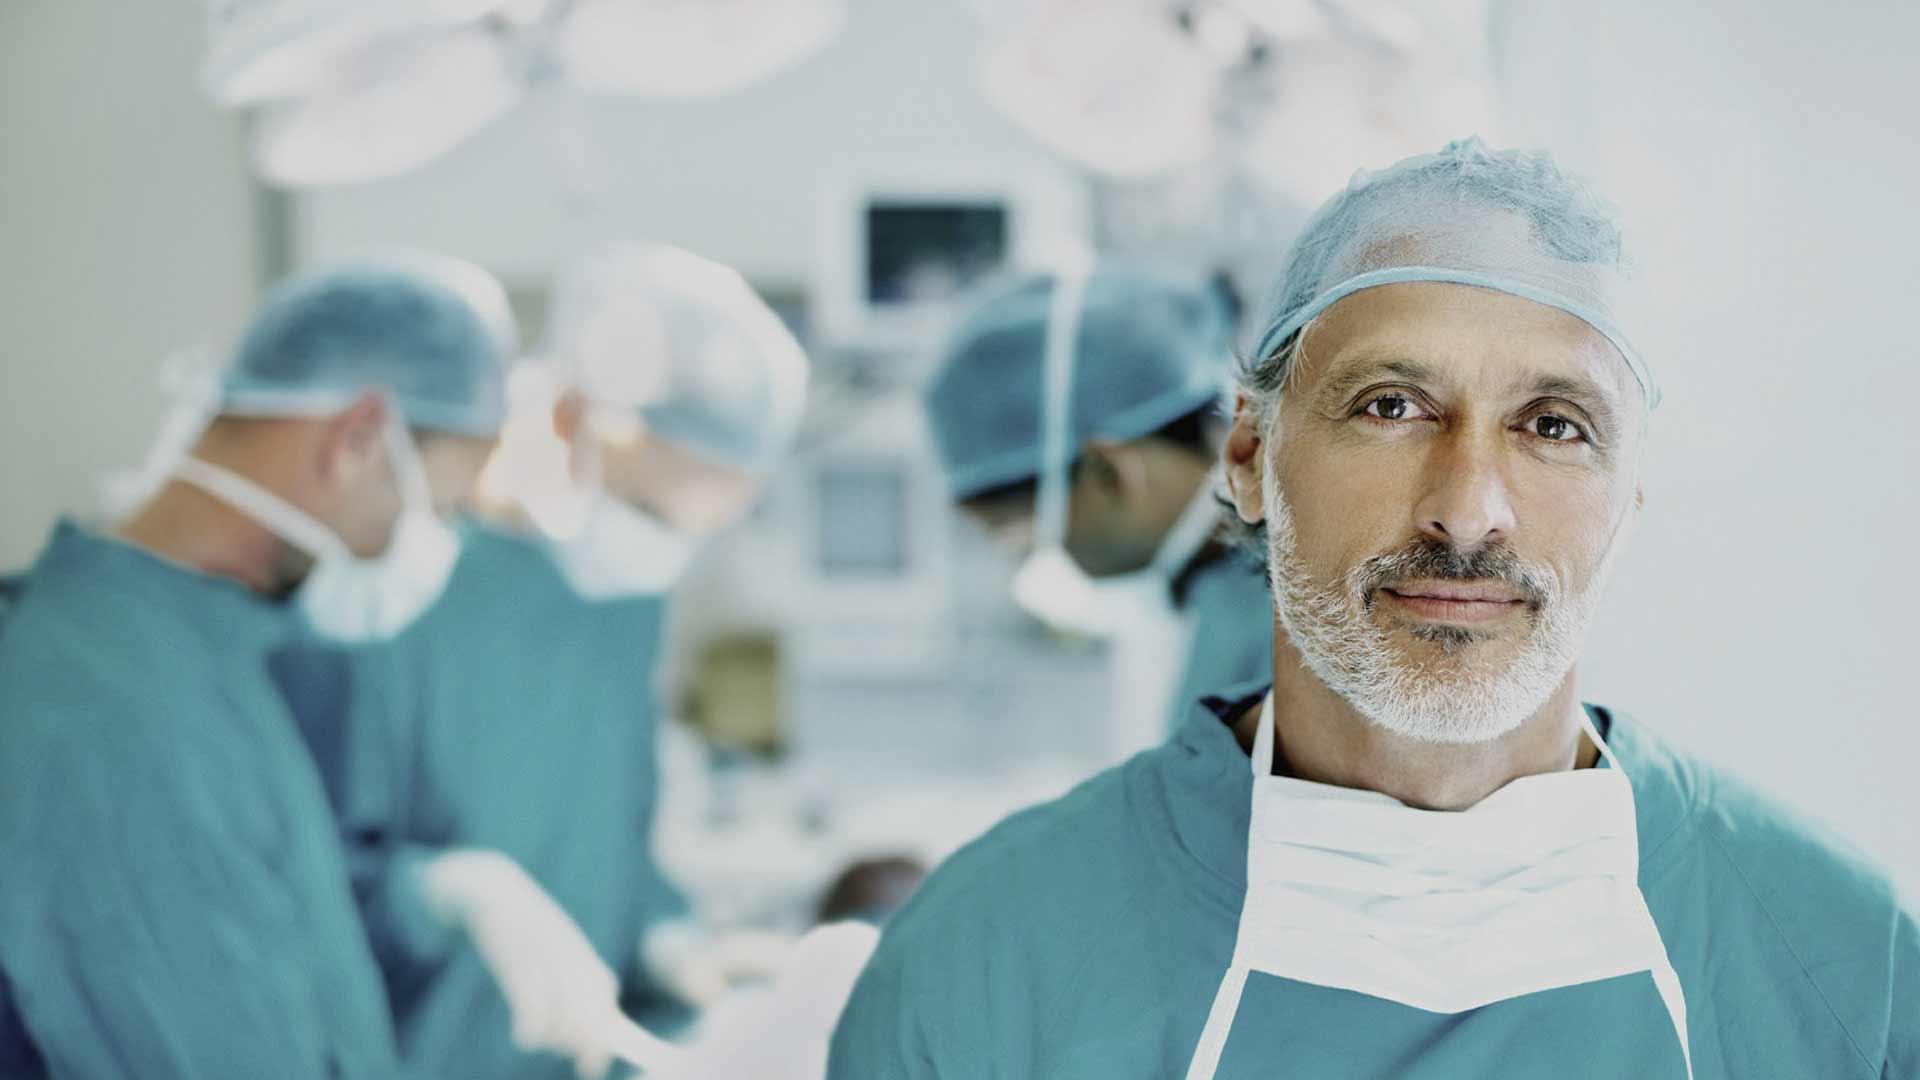 Surgeon Operating room